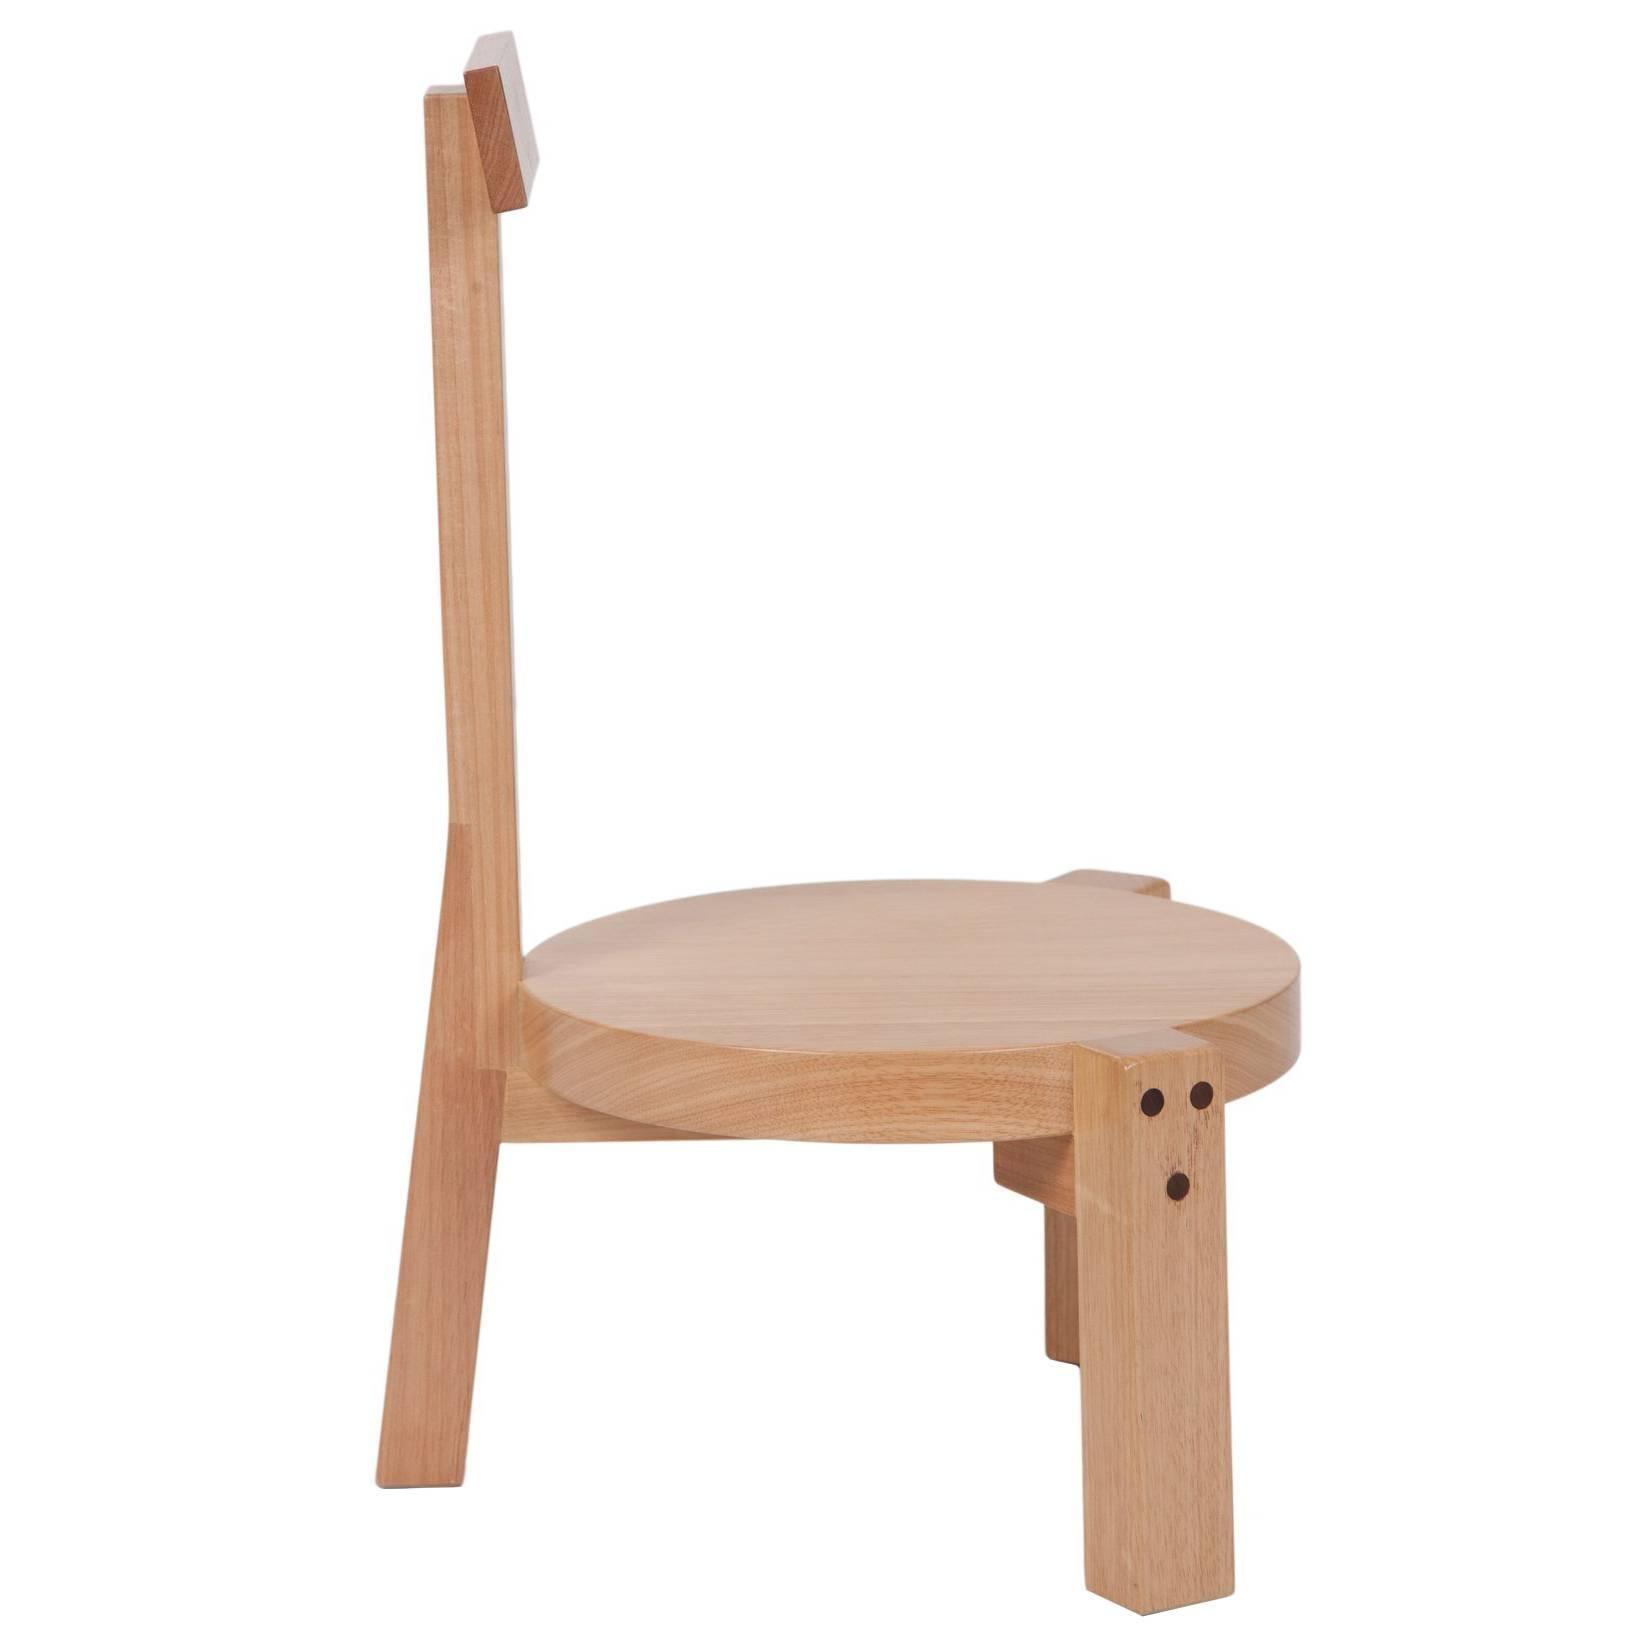 Charmant Girafa Short Chair, Modern Brazilian Design, Handmade Of Solid Wood For Sale